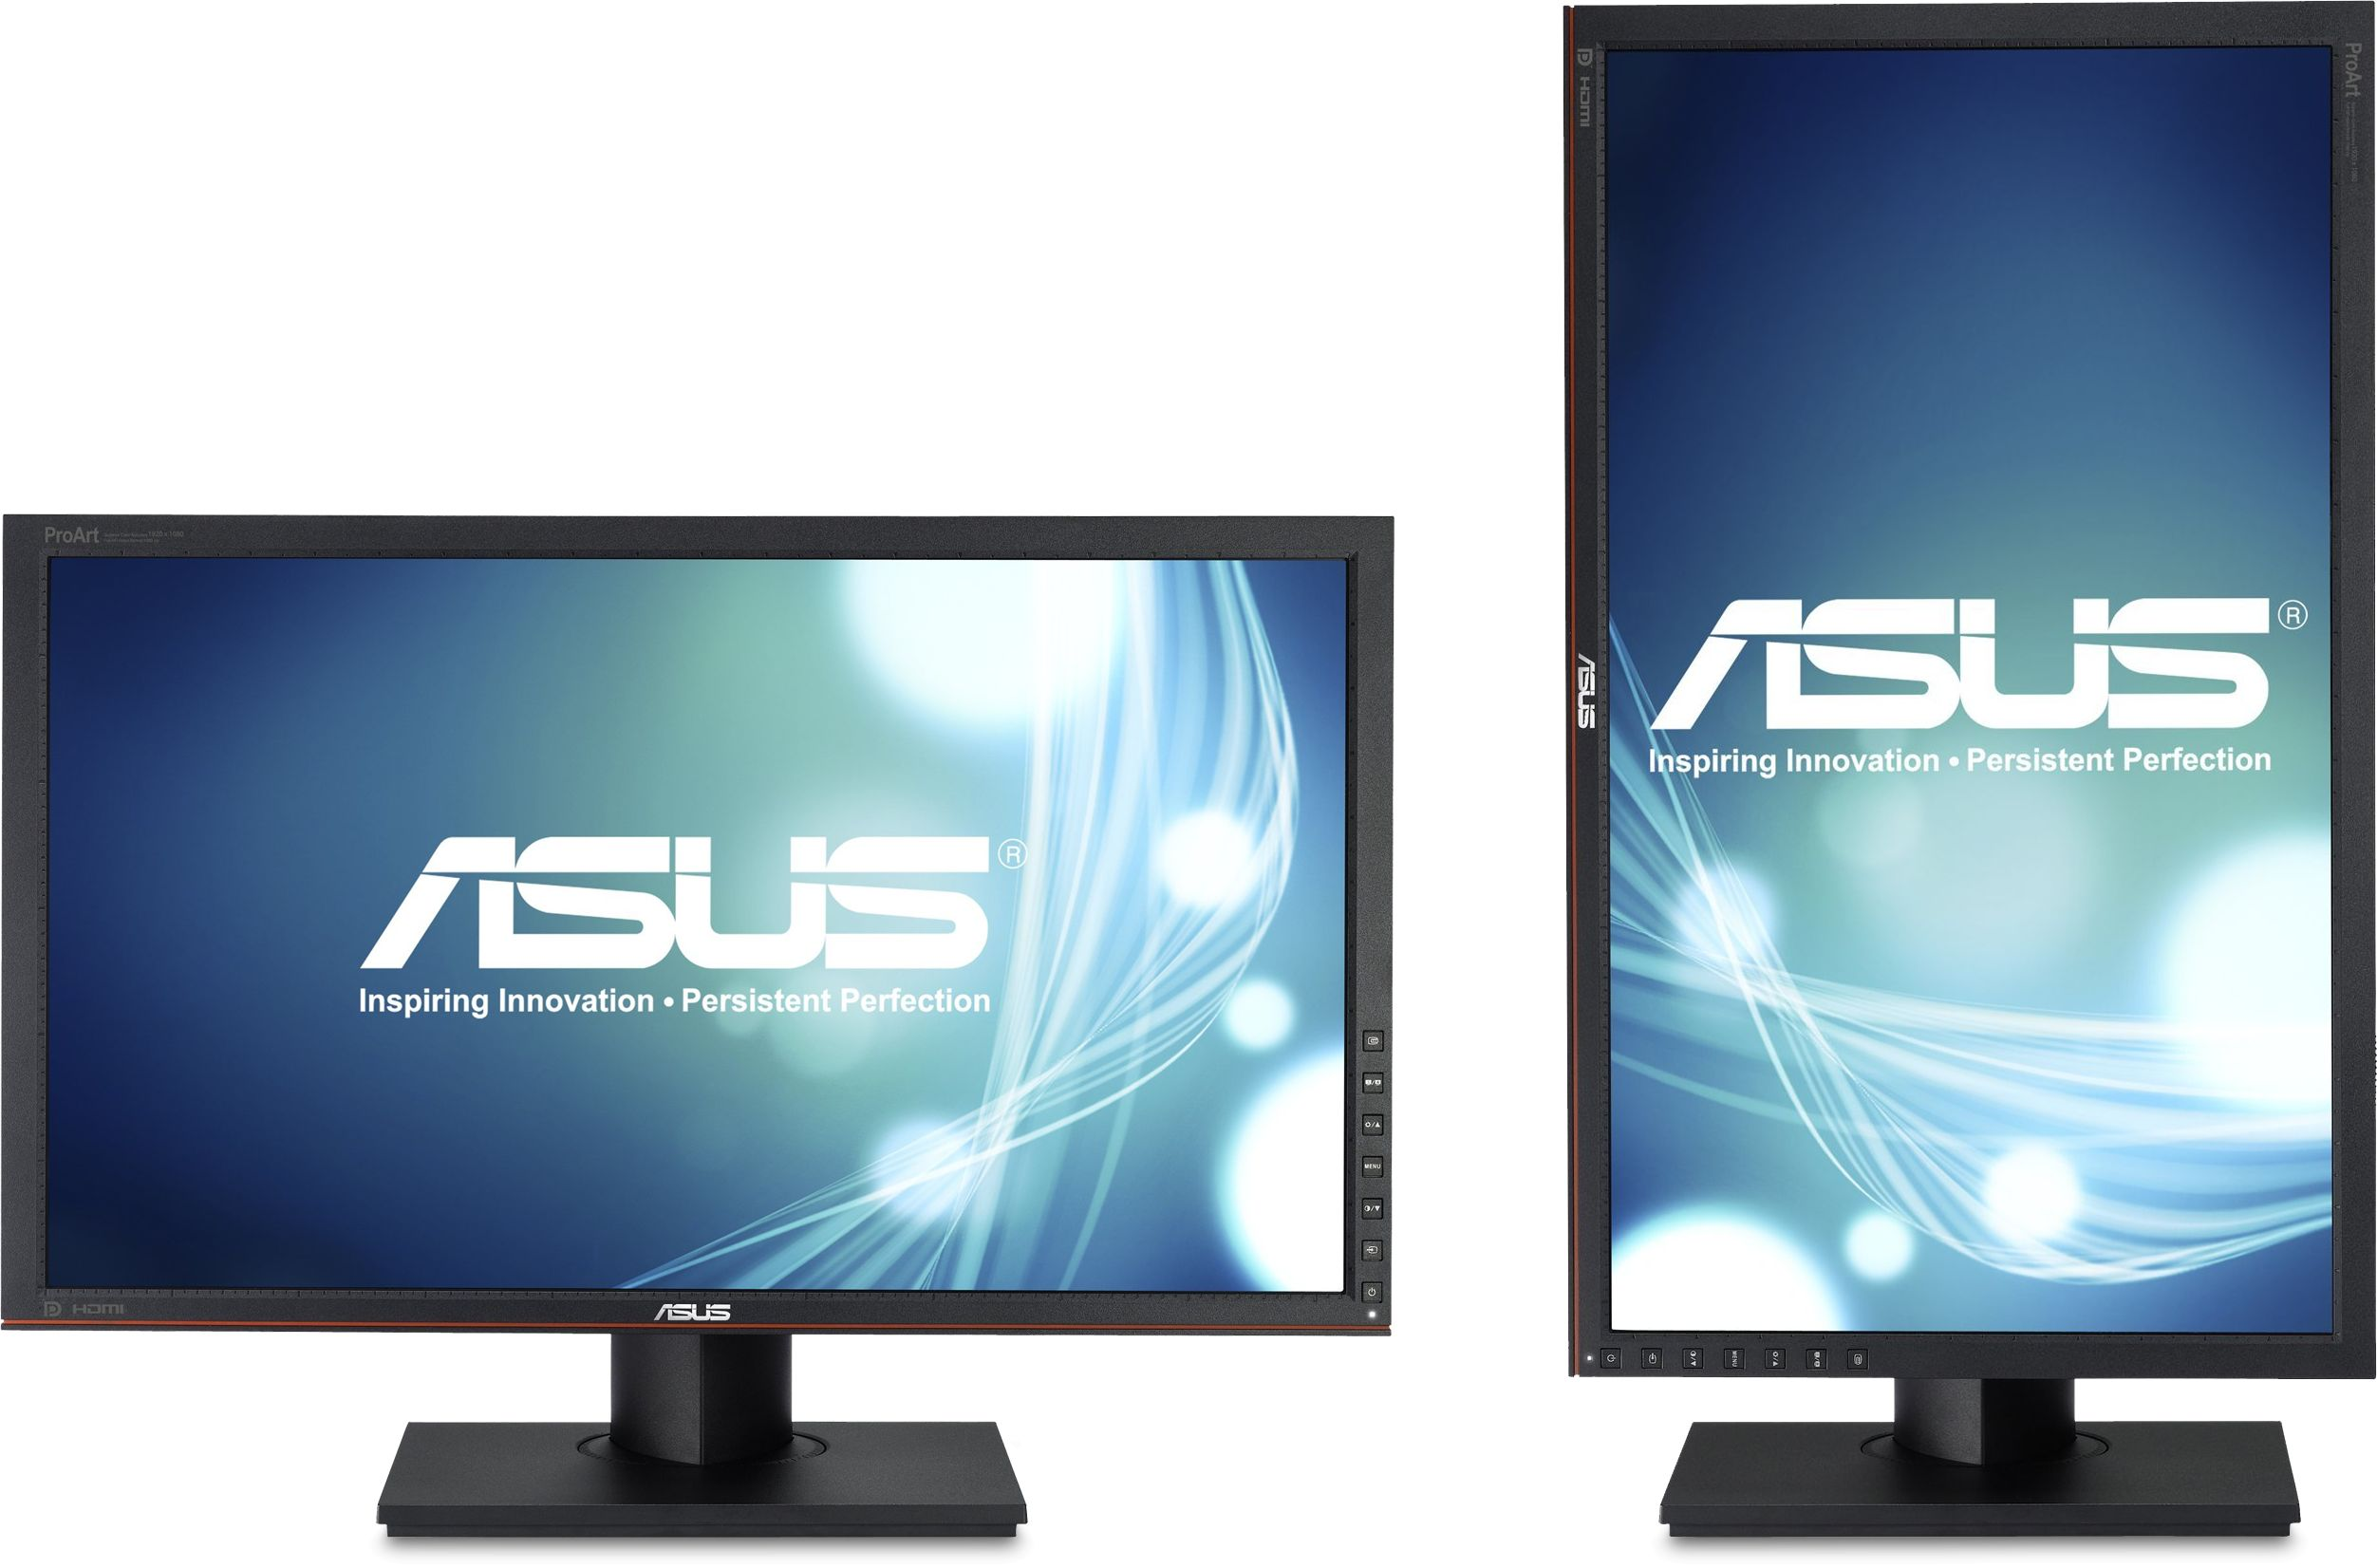 PA238QR 23inch IPS Professional Monitor 1080P 6ms HDMI/DVI/DP/VGA